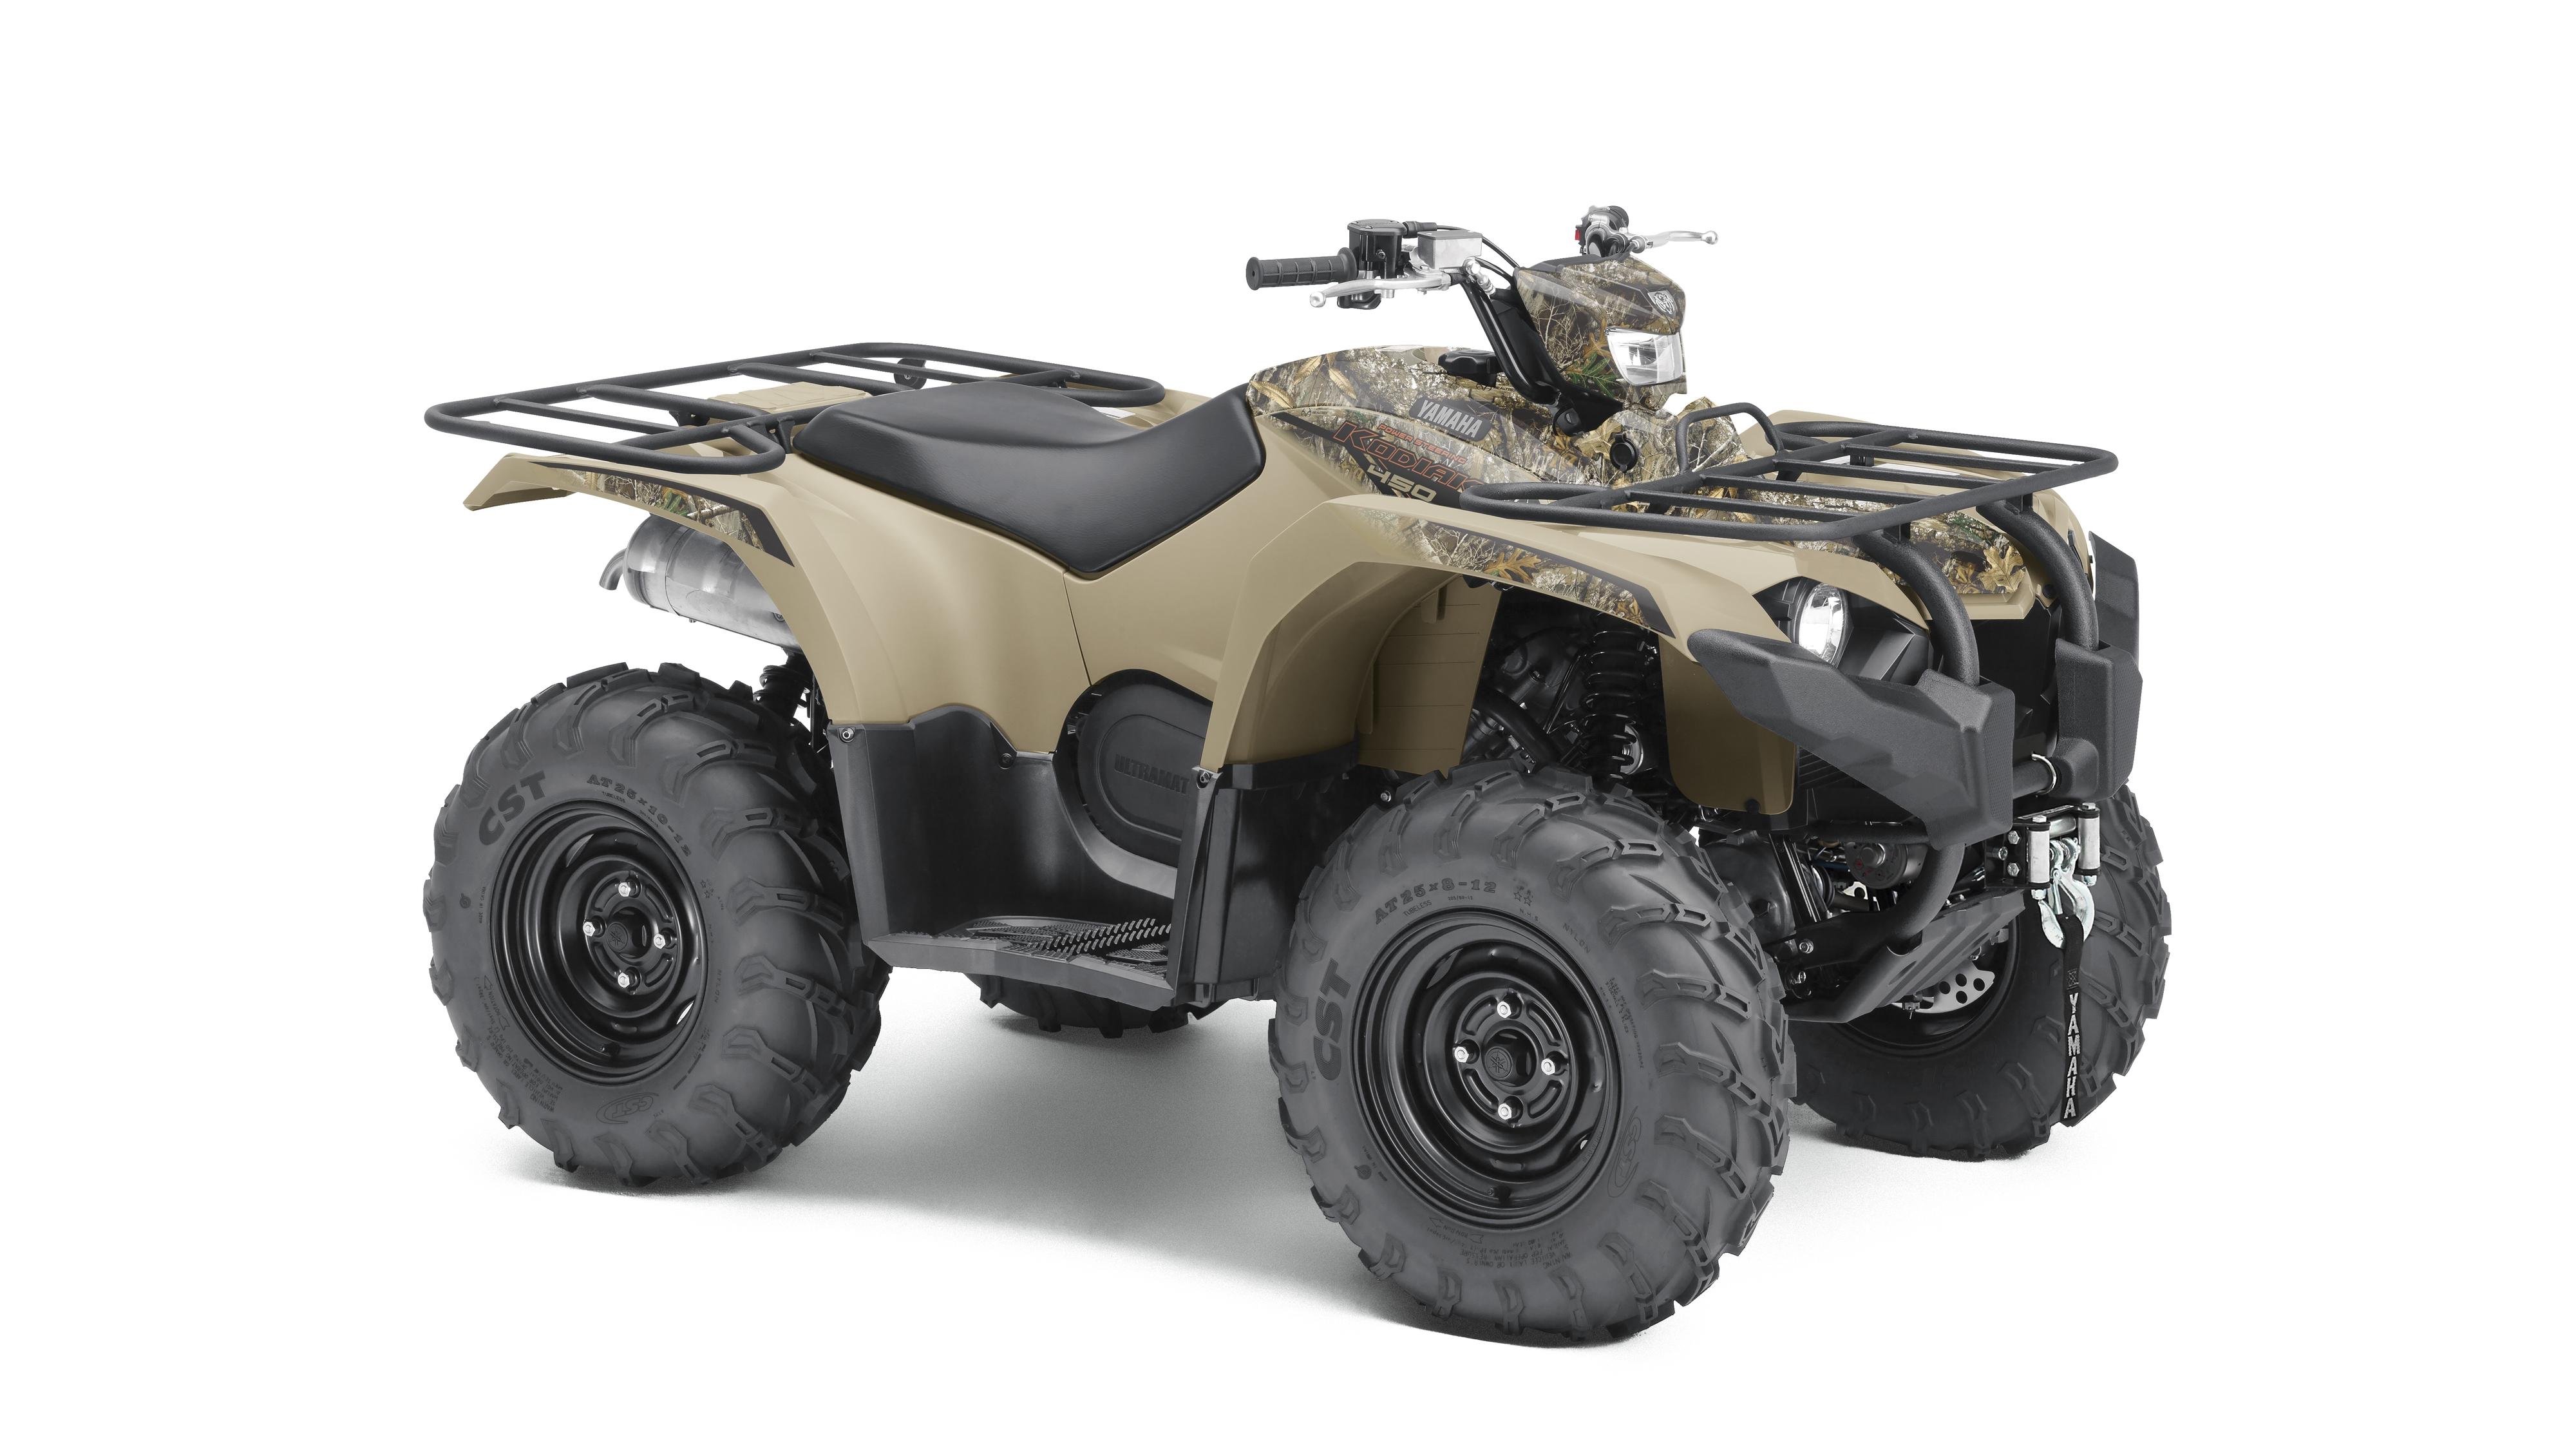 Yamaha Kodiak 400 EPS nu bestellen